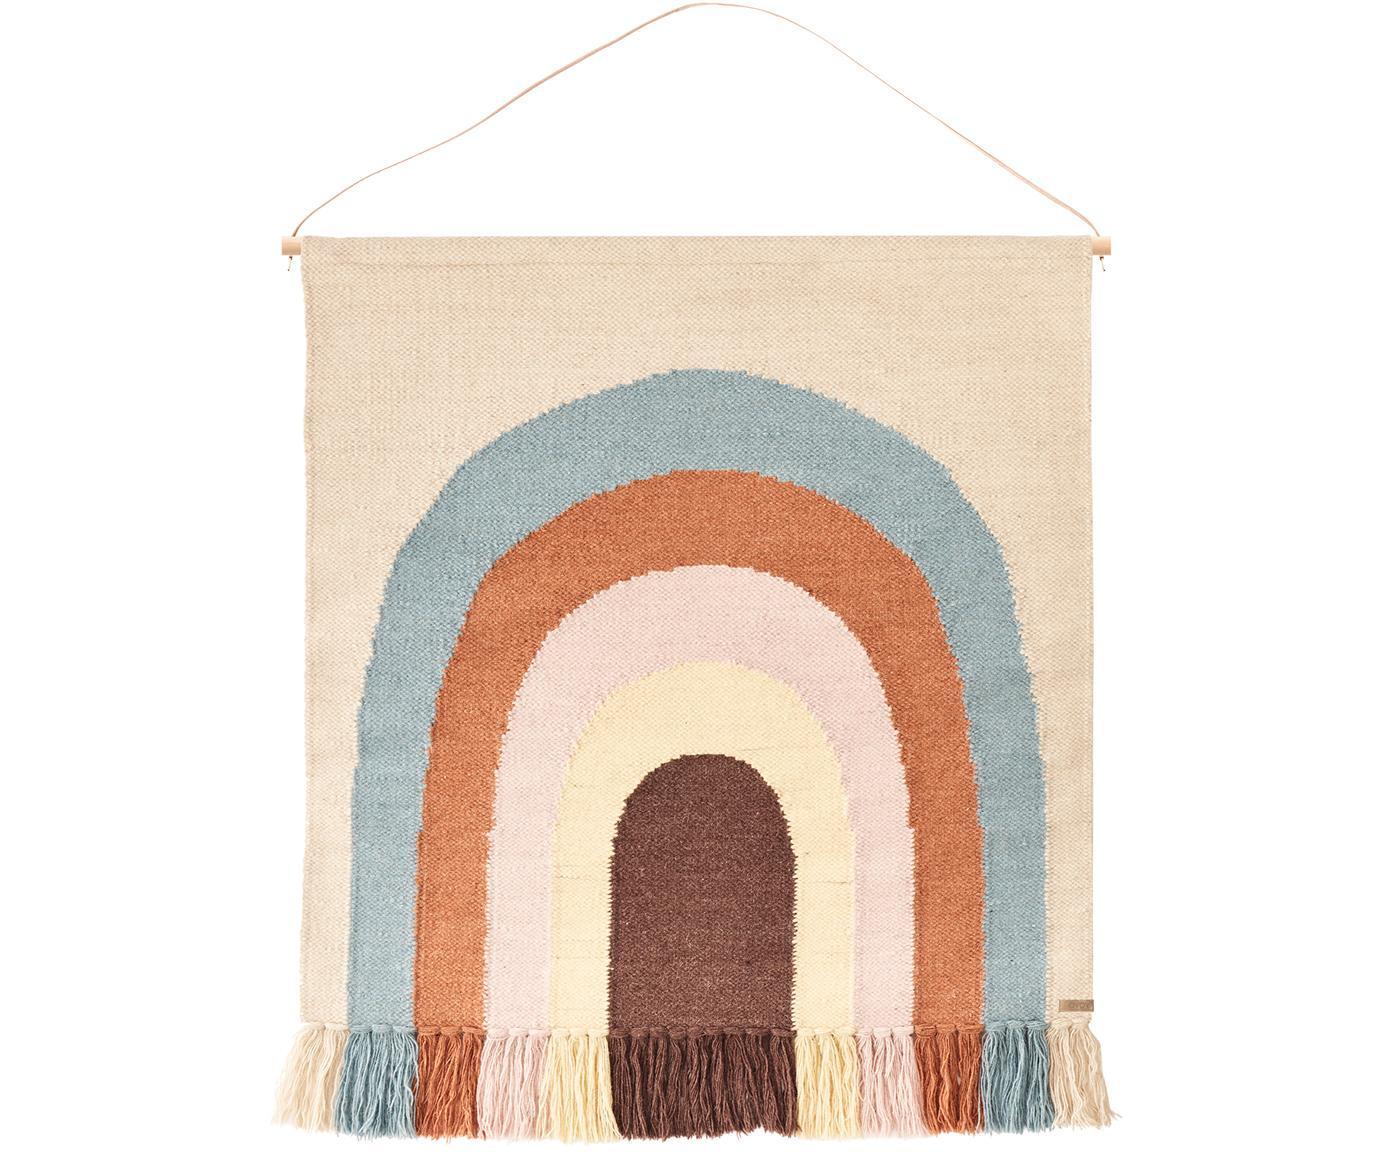 Decorazione da parete Rainbow, 80% lana, 20% cotone, Beige, blu, arancione, rosa, crema, rosa cipria, Larg. 100 x Alt. 115 cm